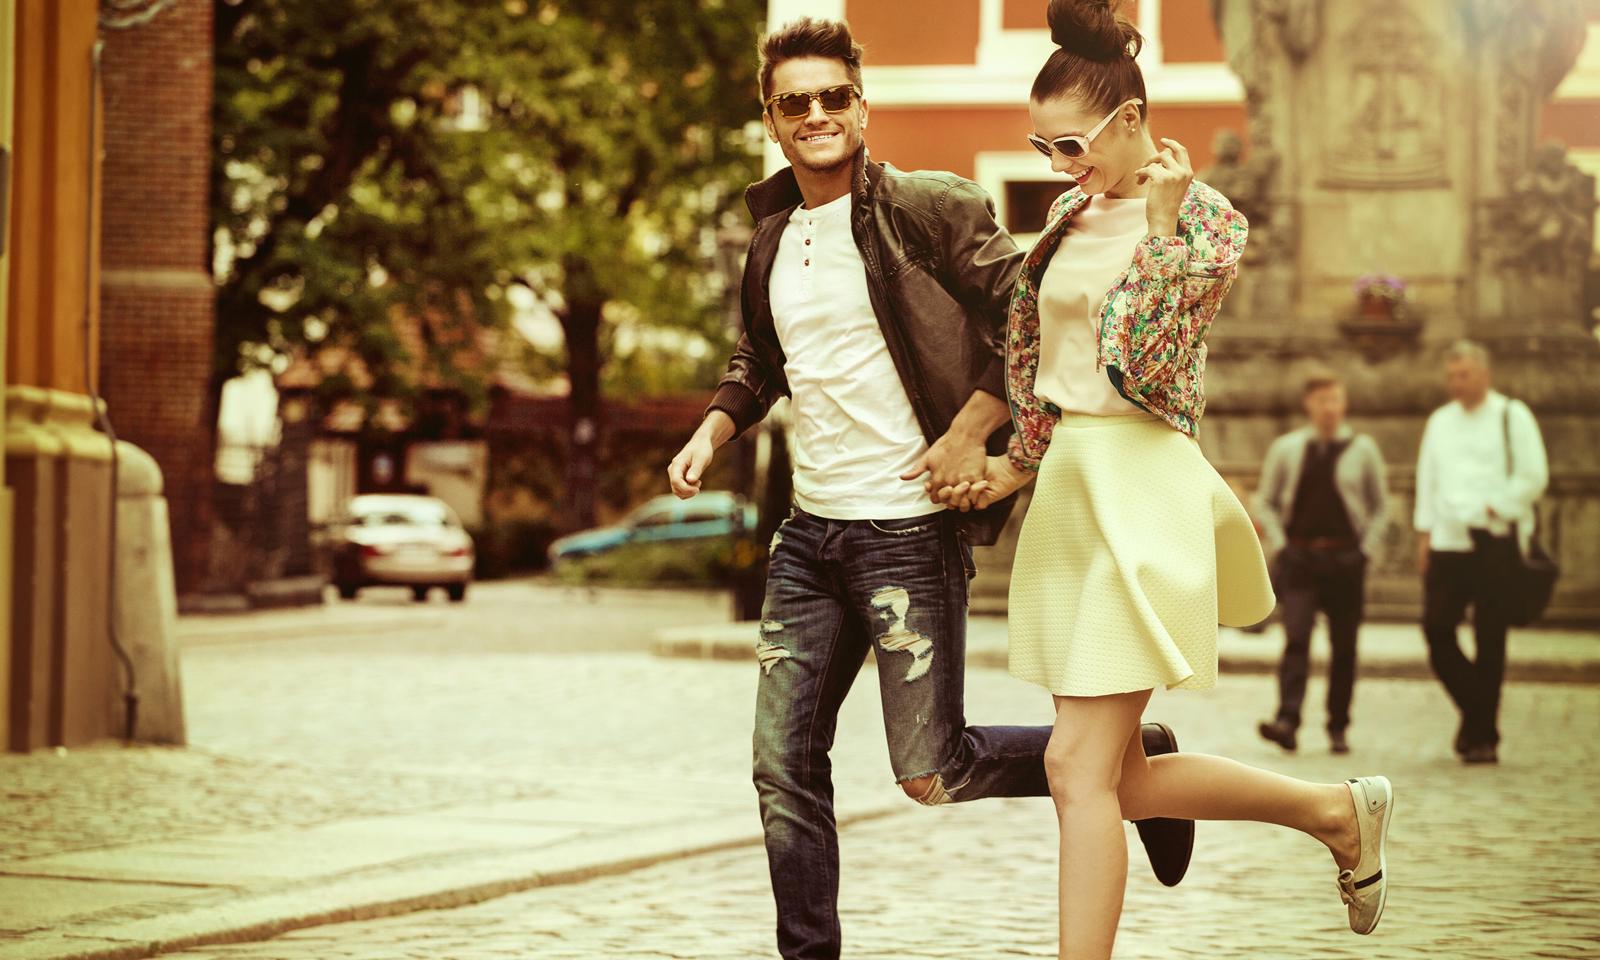 AdobeStock_86657394-couple-running-street-first-date-questions